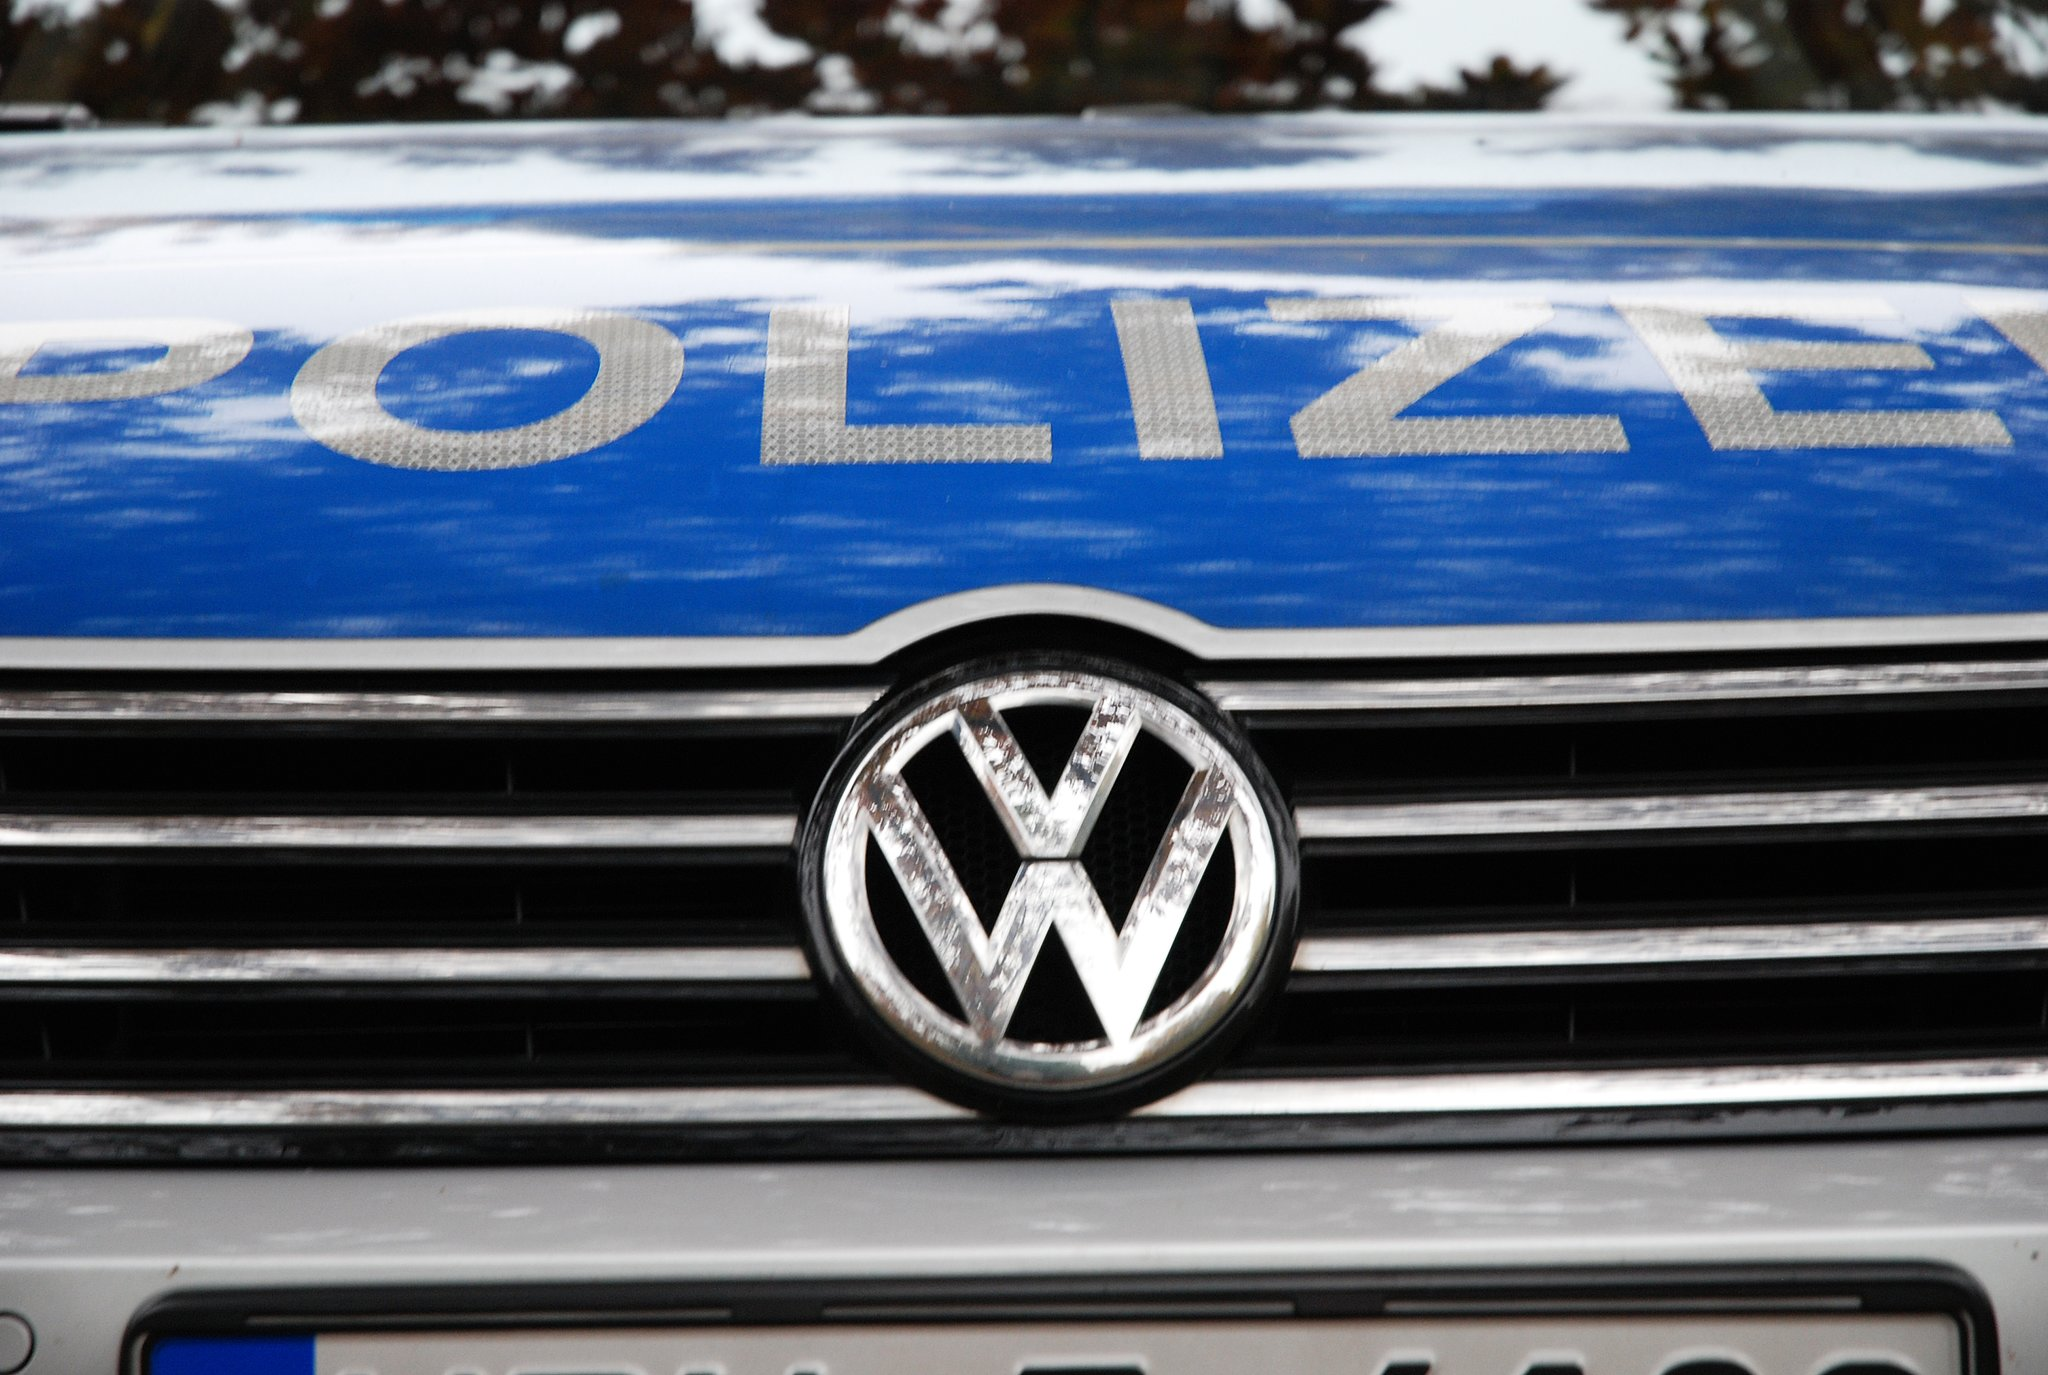 Polizei sucht Zeugen: Unfallflucht an der Leipziger Straße - Lokalkompass.de